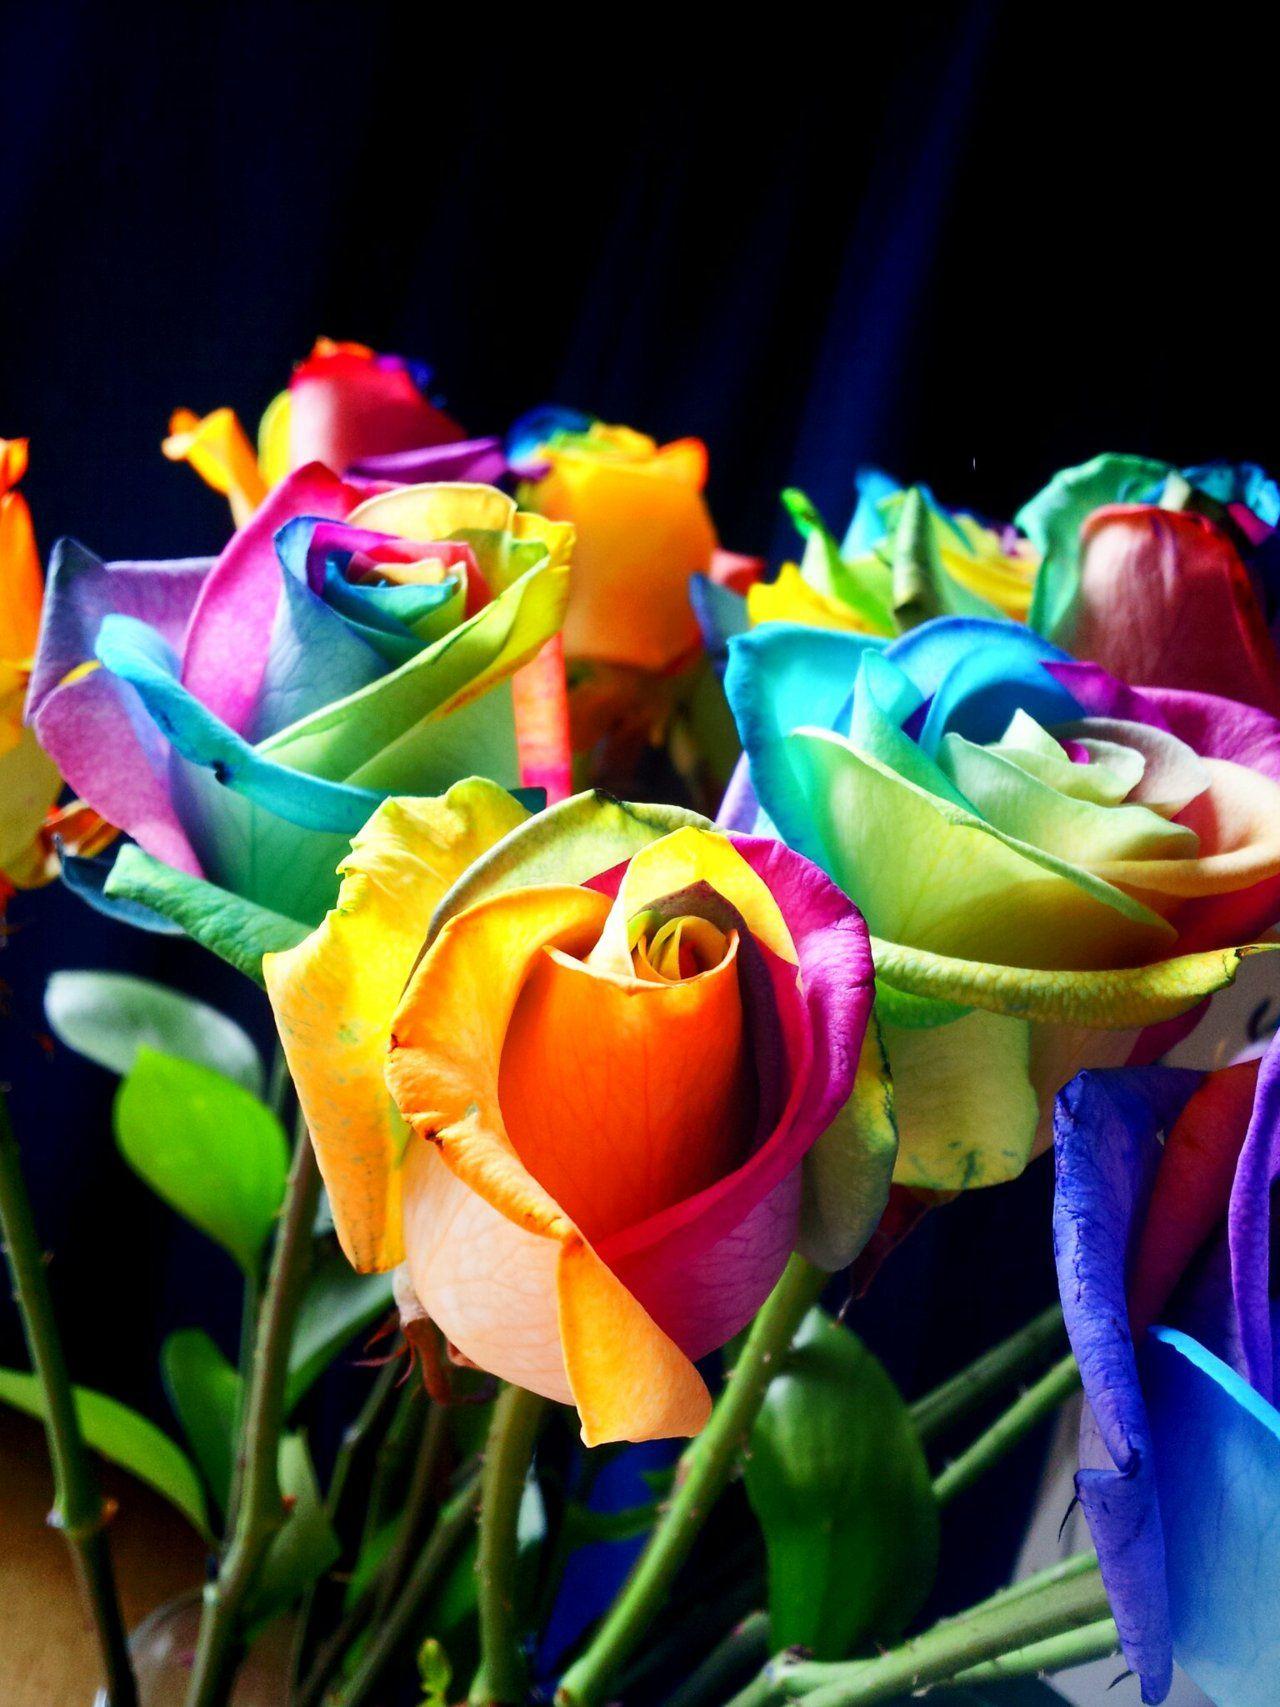 Rainbow Roses Weddings Pinterest Rainbow Roses Flowers And